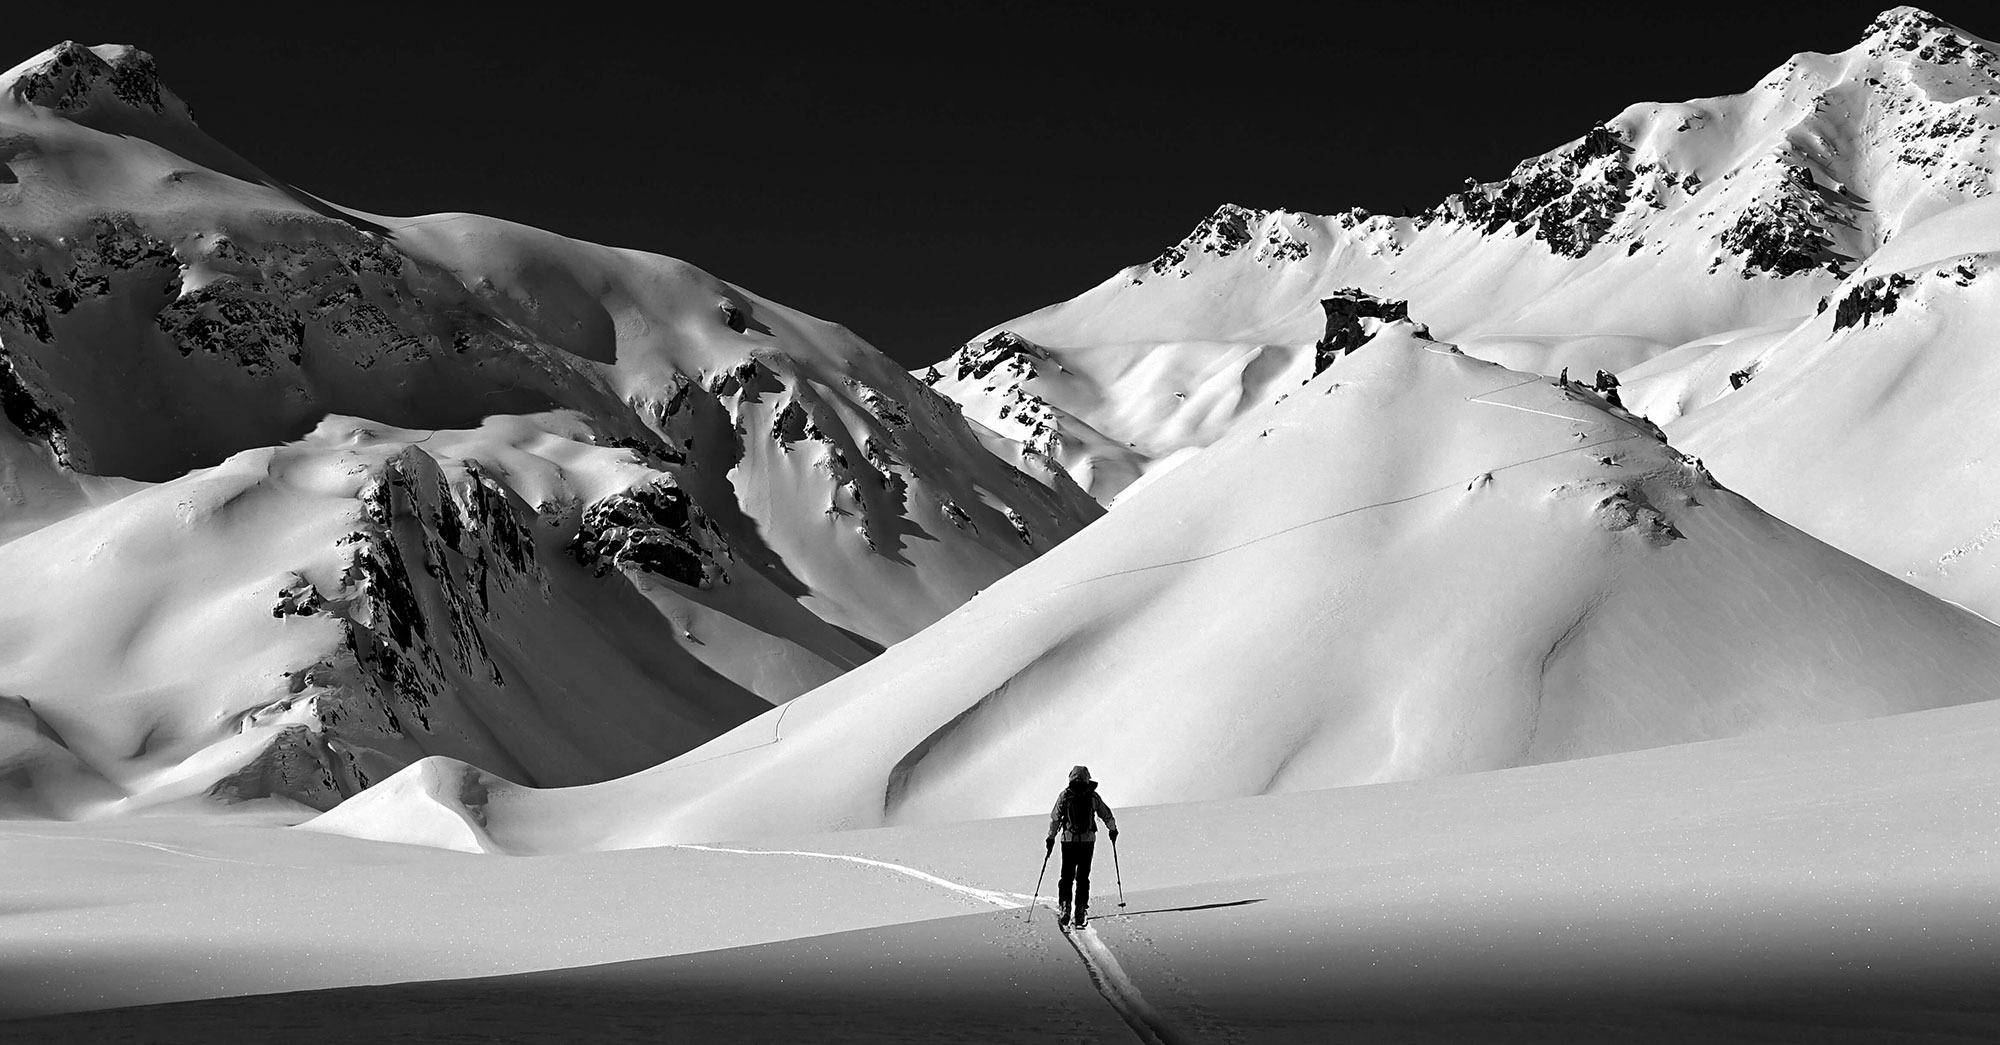 Skis Movement 2016